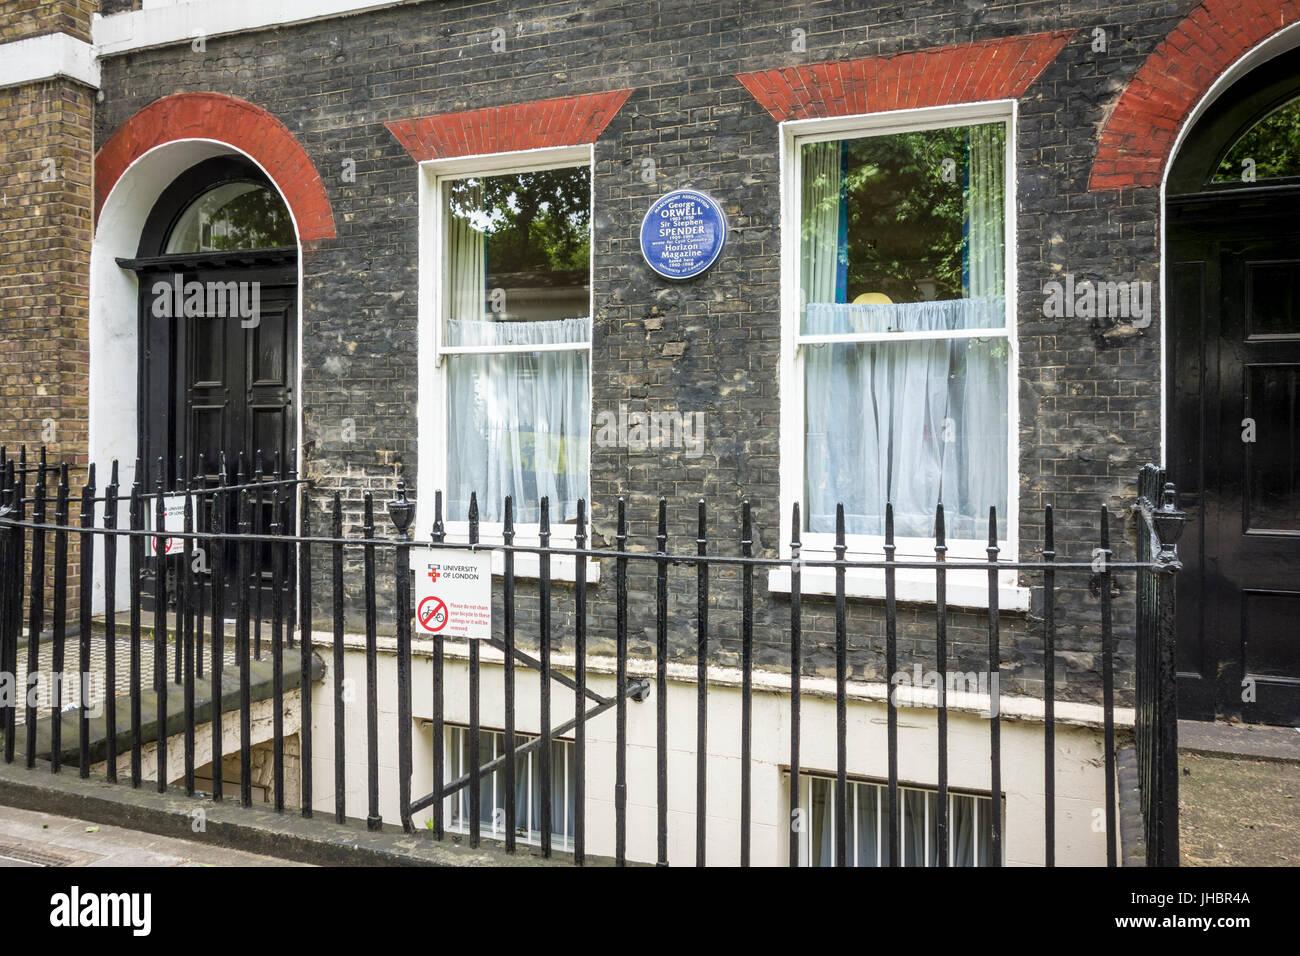 Blaue Plakette, George Orwell, Sir Stephen Spender, Horizont Magazin, Lansdowne Terrasse, London, UK Stockbild